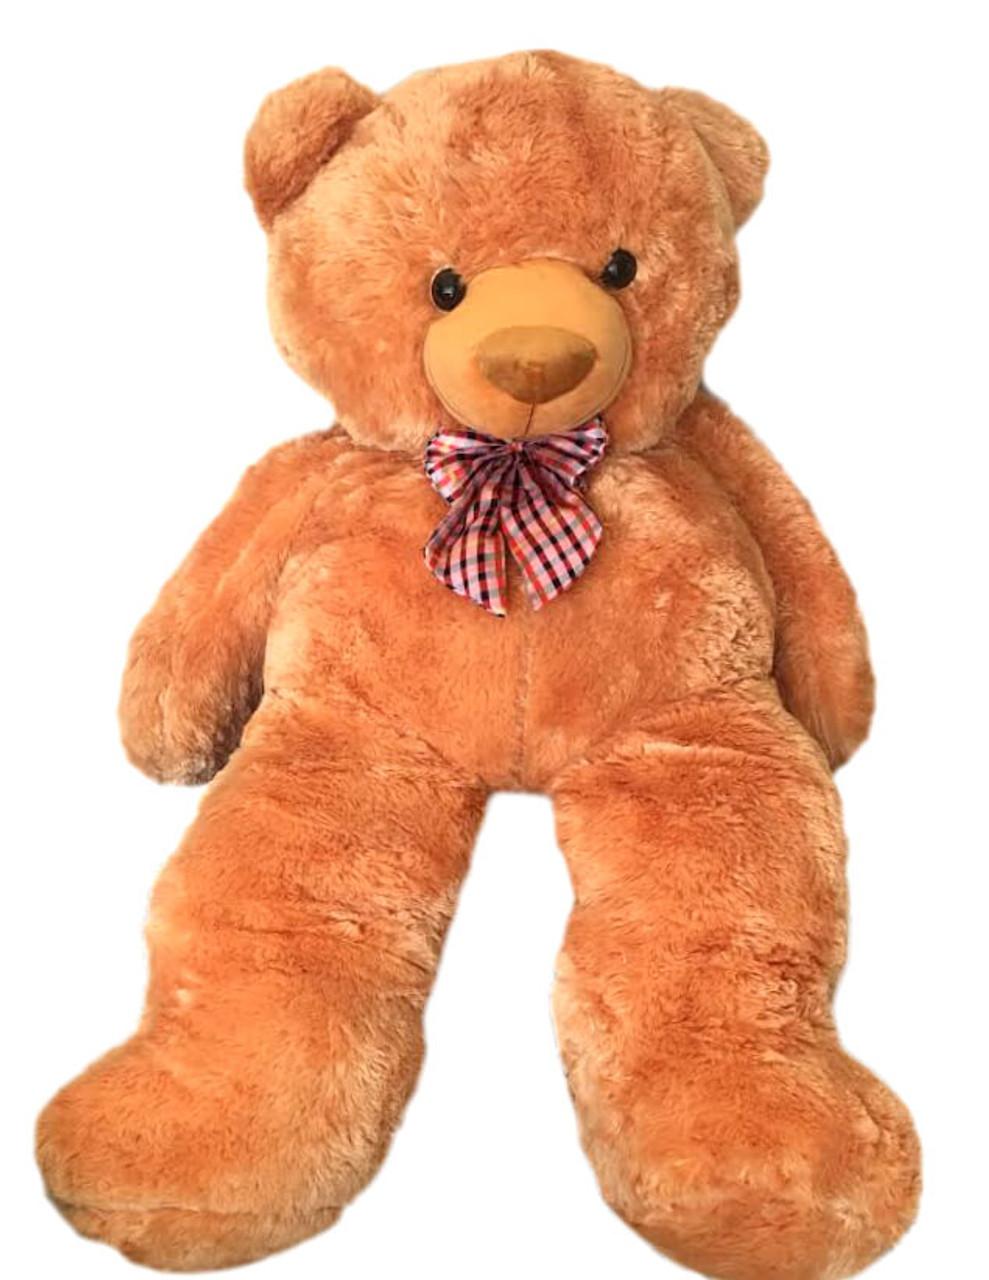 Human size 4'6 ft. Light Brown Teddy Bear - Best Seller